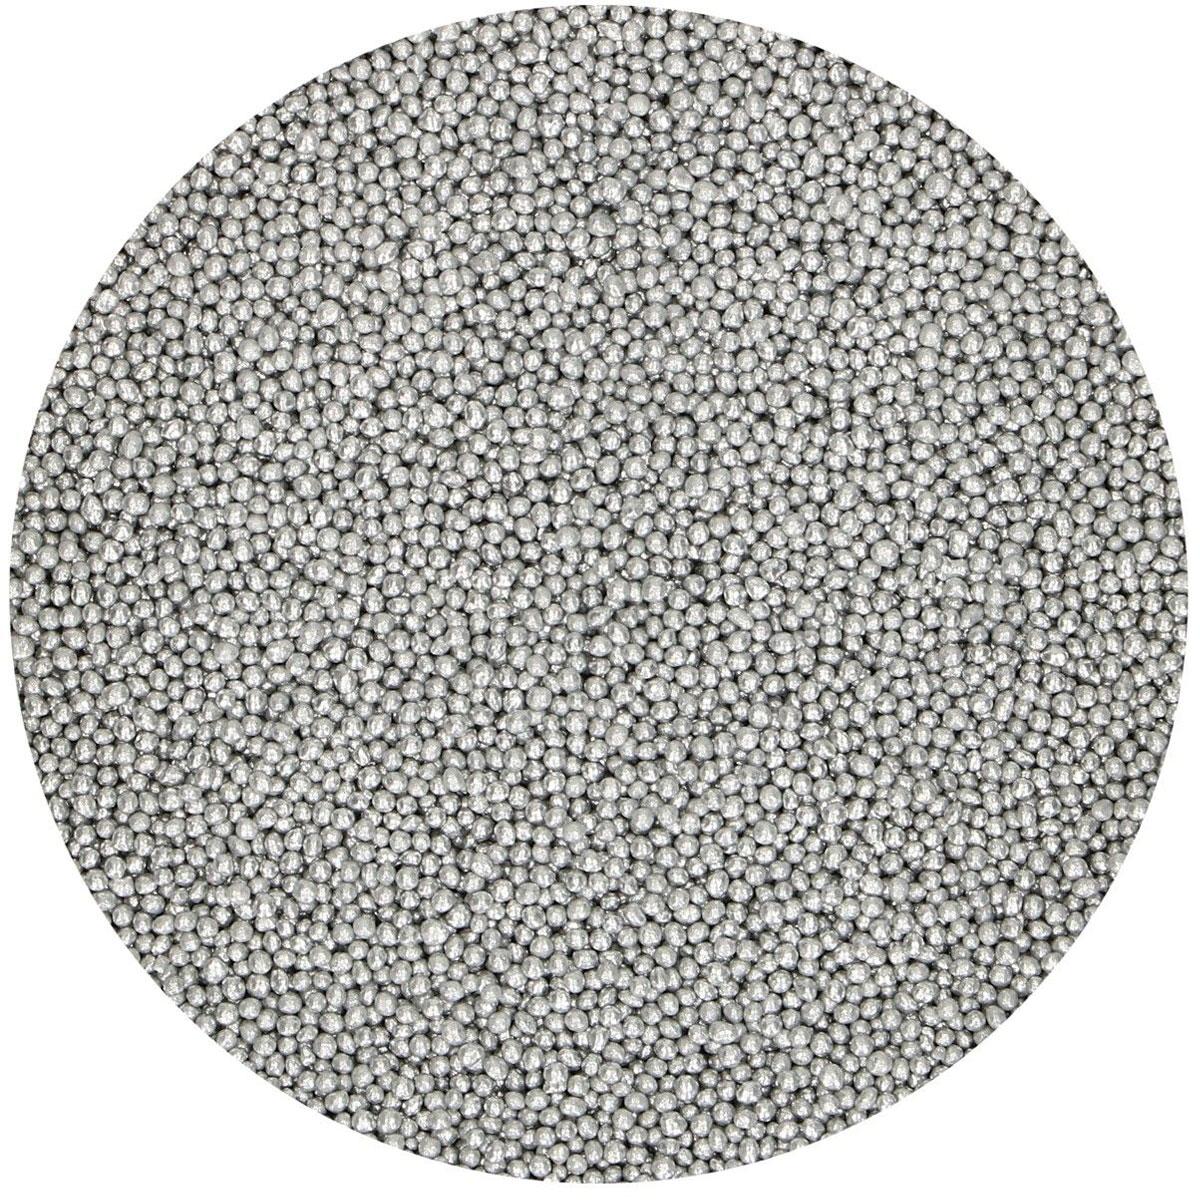 Funcakes Nonpareils Zuckerperlen - Silber 80g